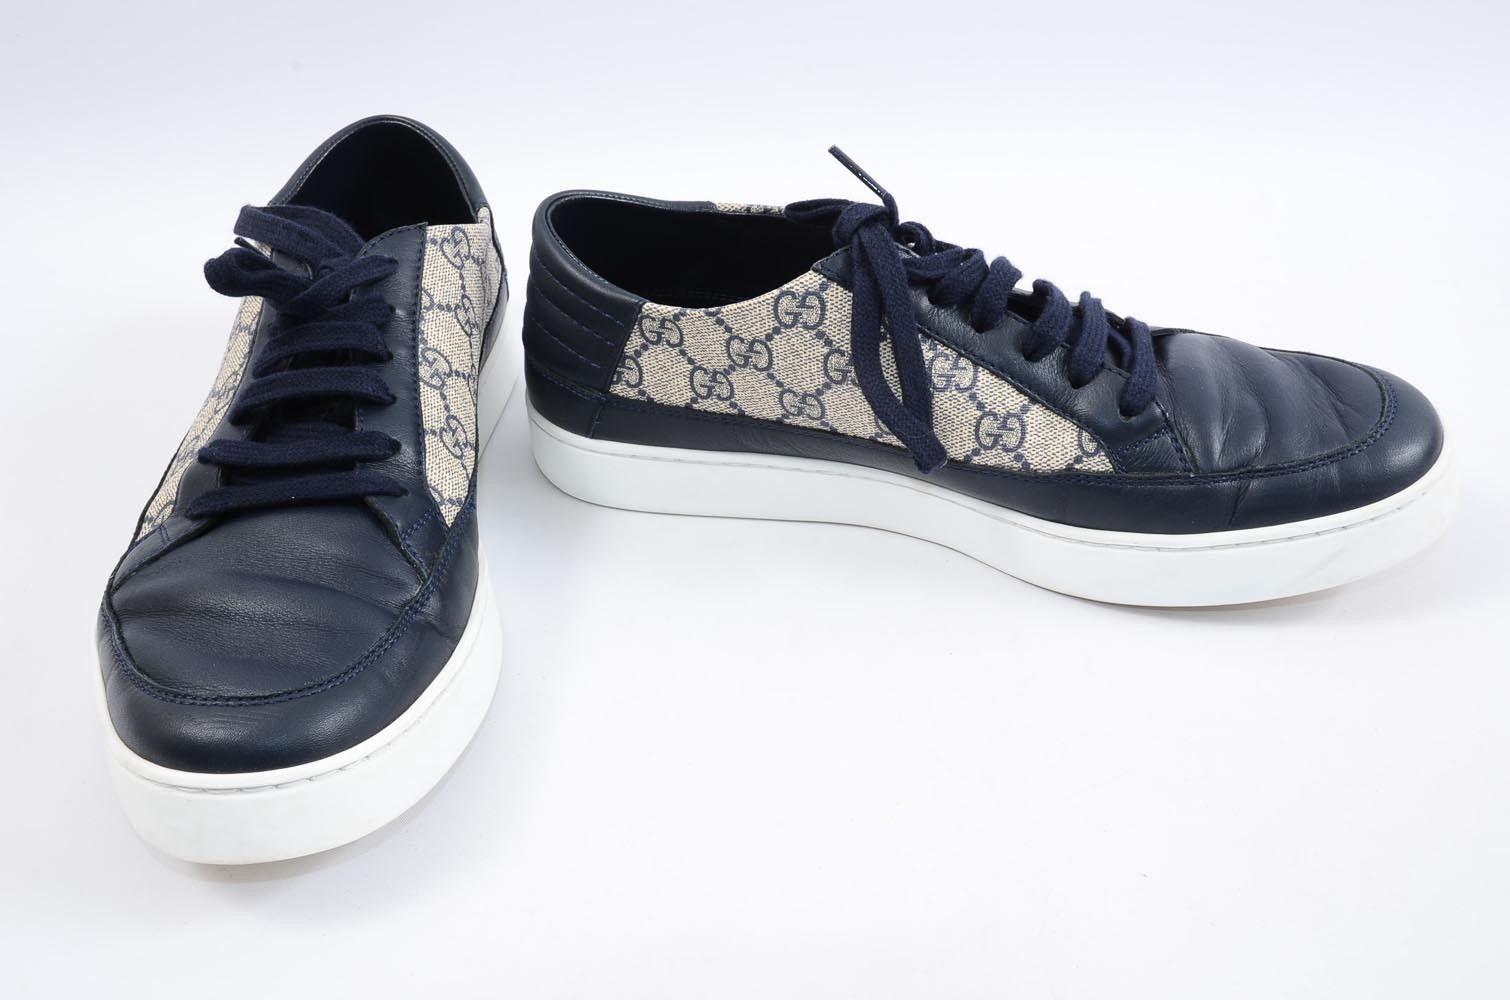 871229fb46e Gucci Common navy beige 10 colorblock GG logo low top sneaker UK 9 ...